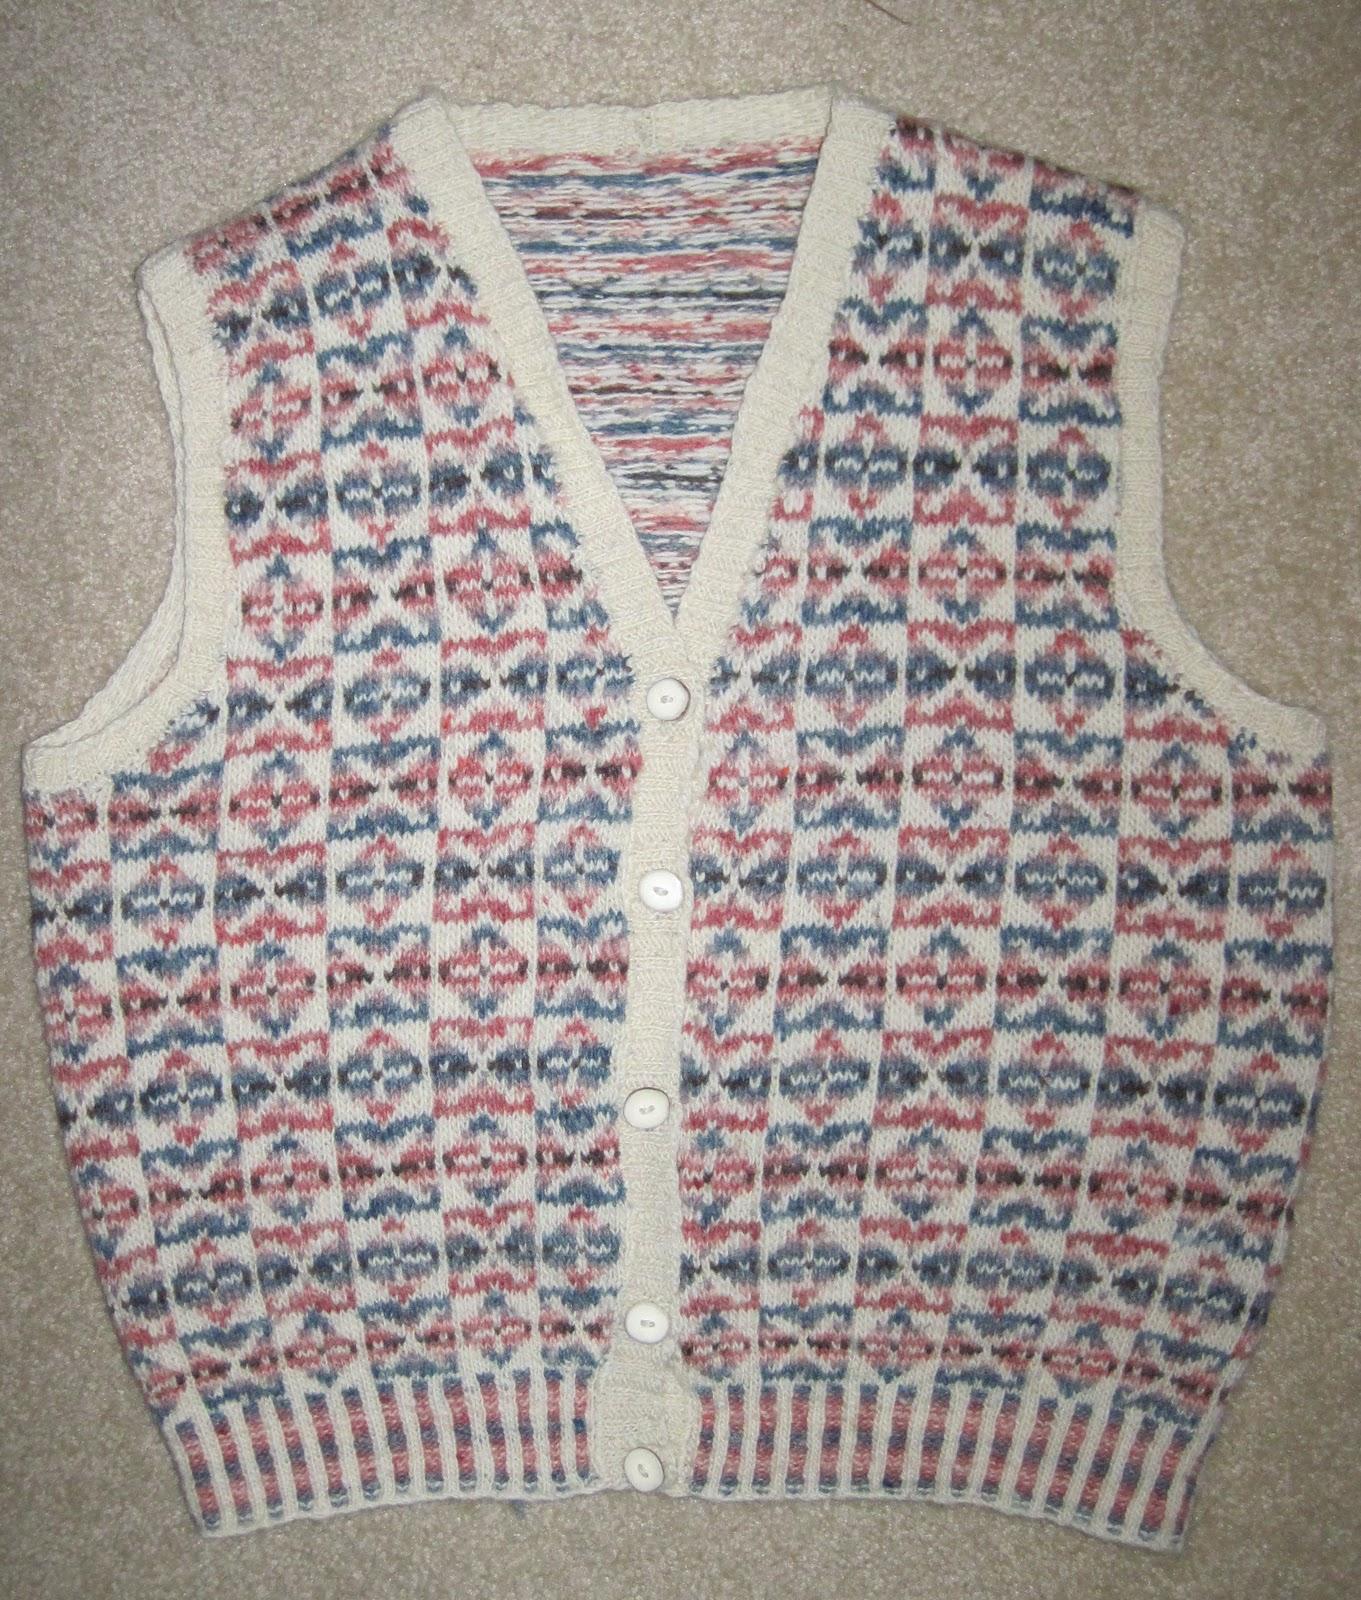 Fair Isle Knitting Patterns : Spinsjal fair isle knitting